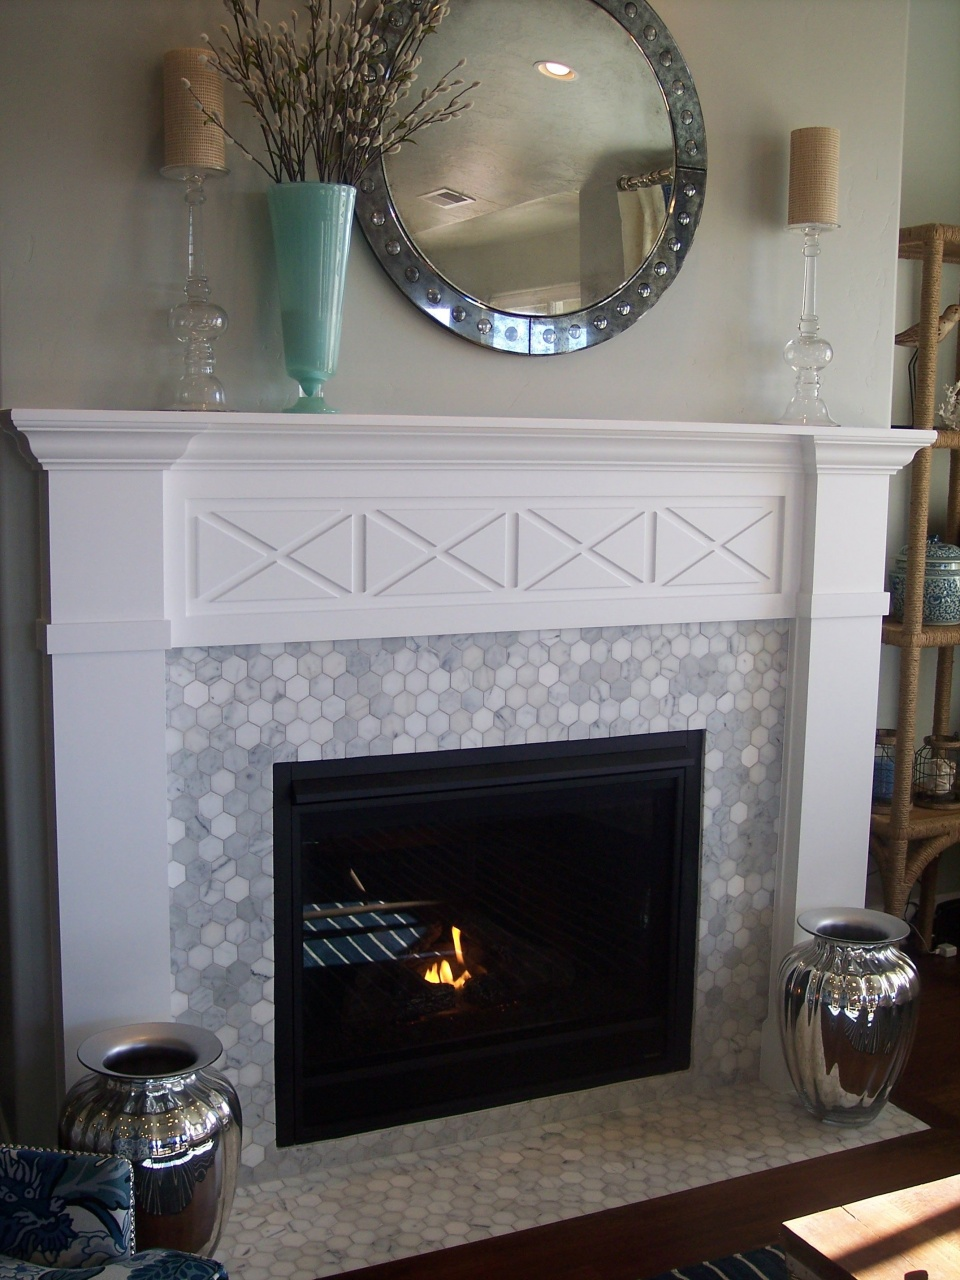 Charm Glow Electric Fireplace Fresh Heat Surge Roll N Glow Electric Fireplace – Fireplace Ideas